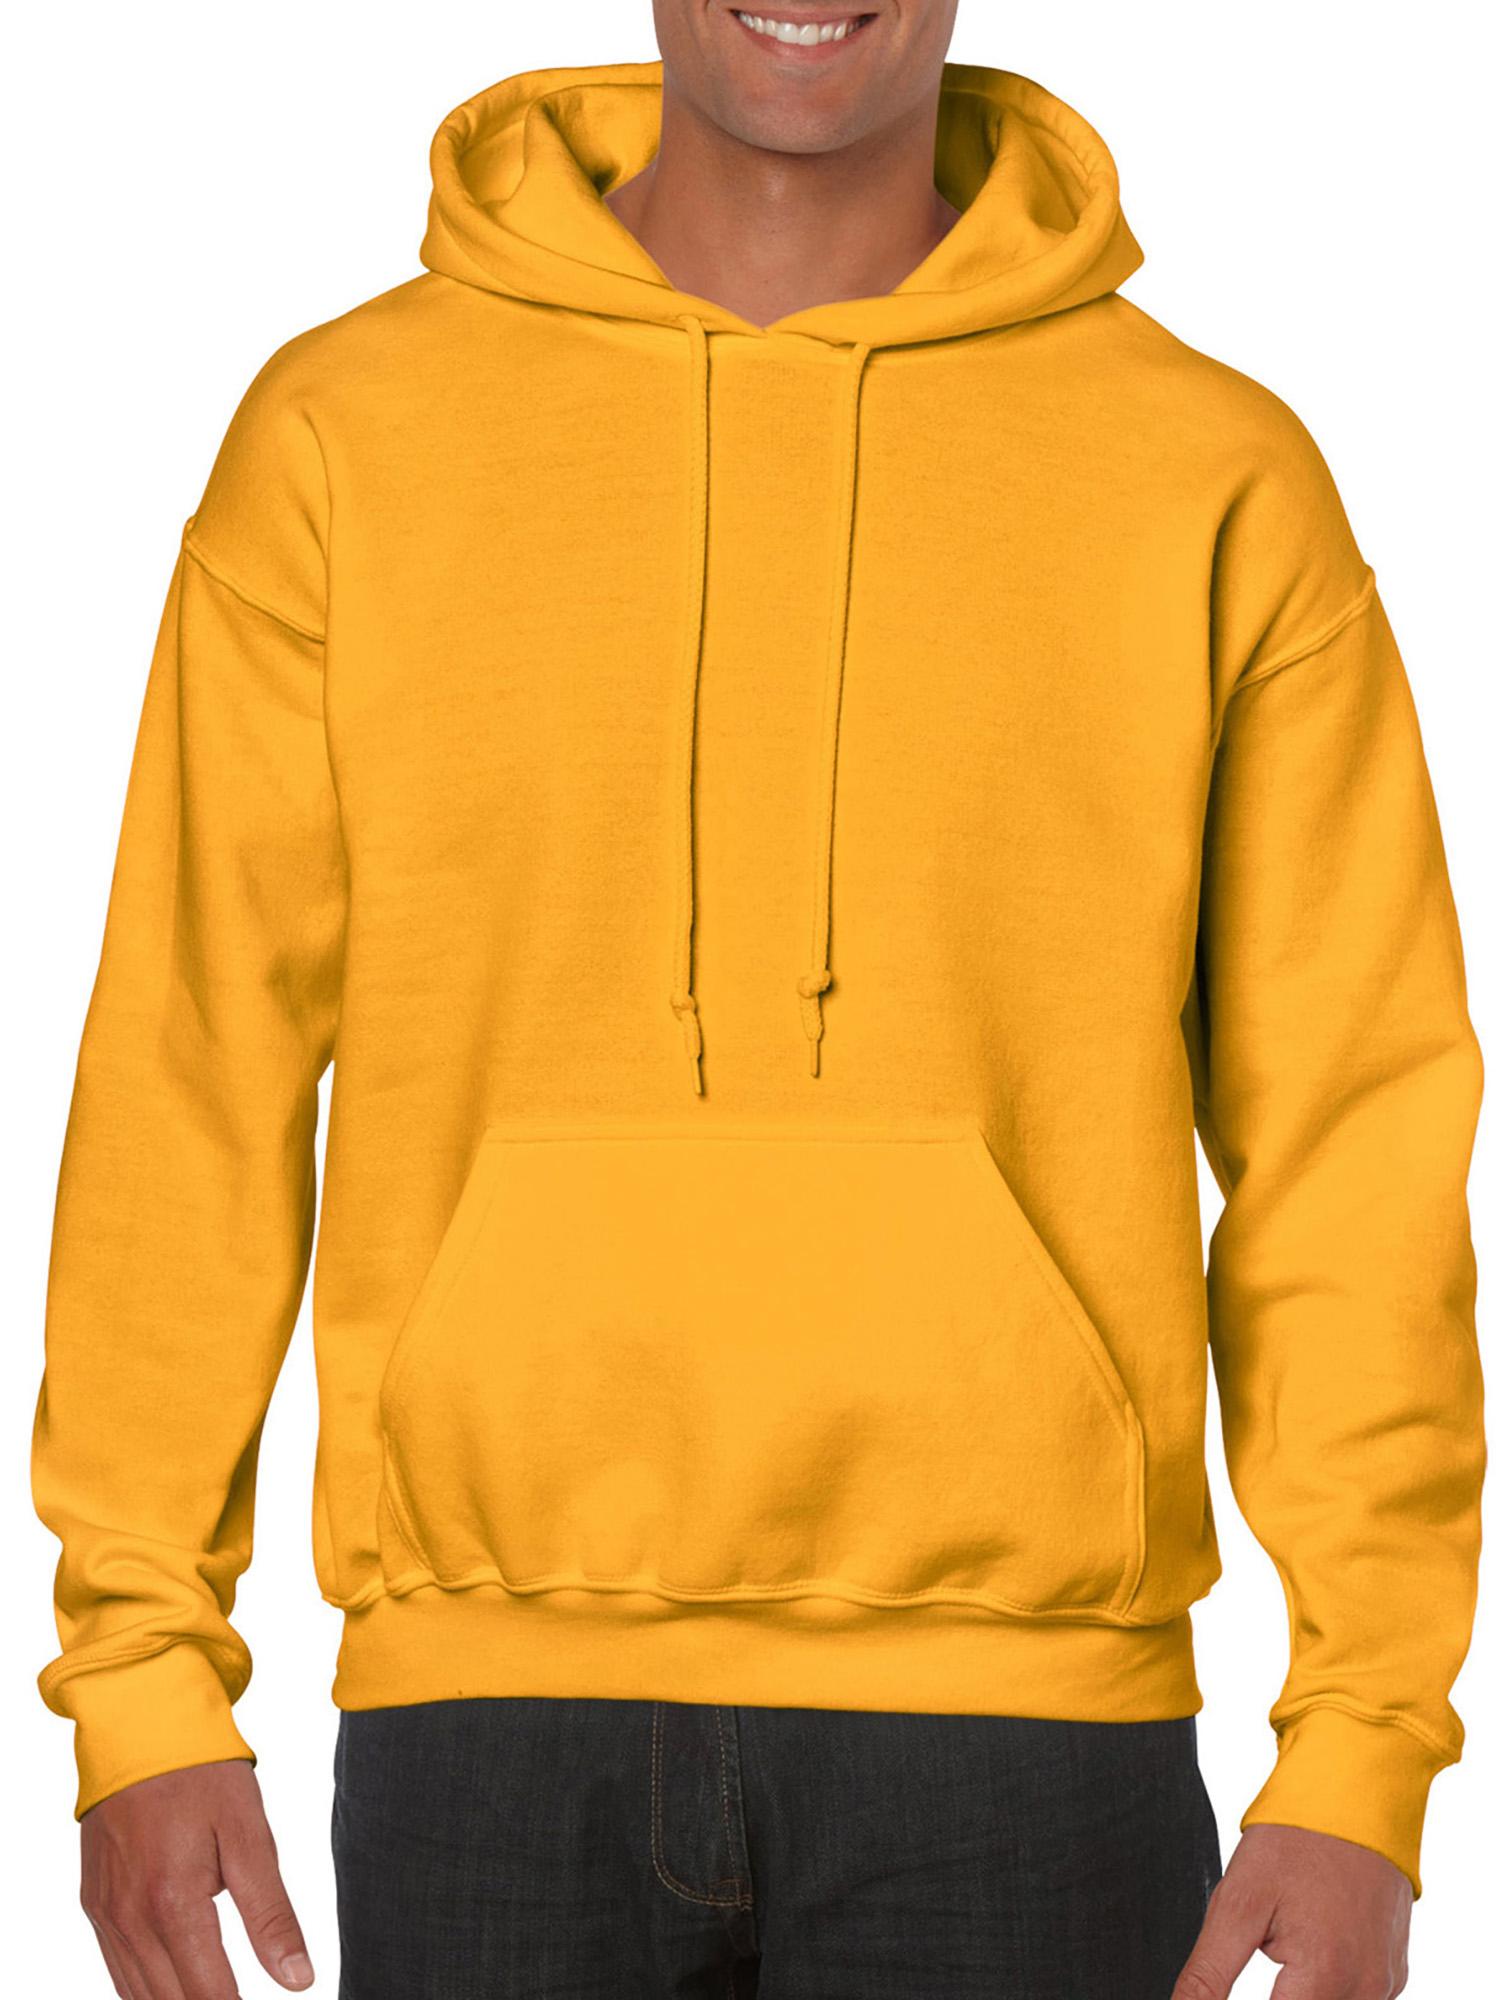 Big Mens Hooded Sweatshirt